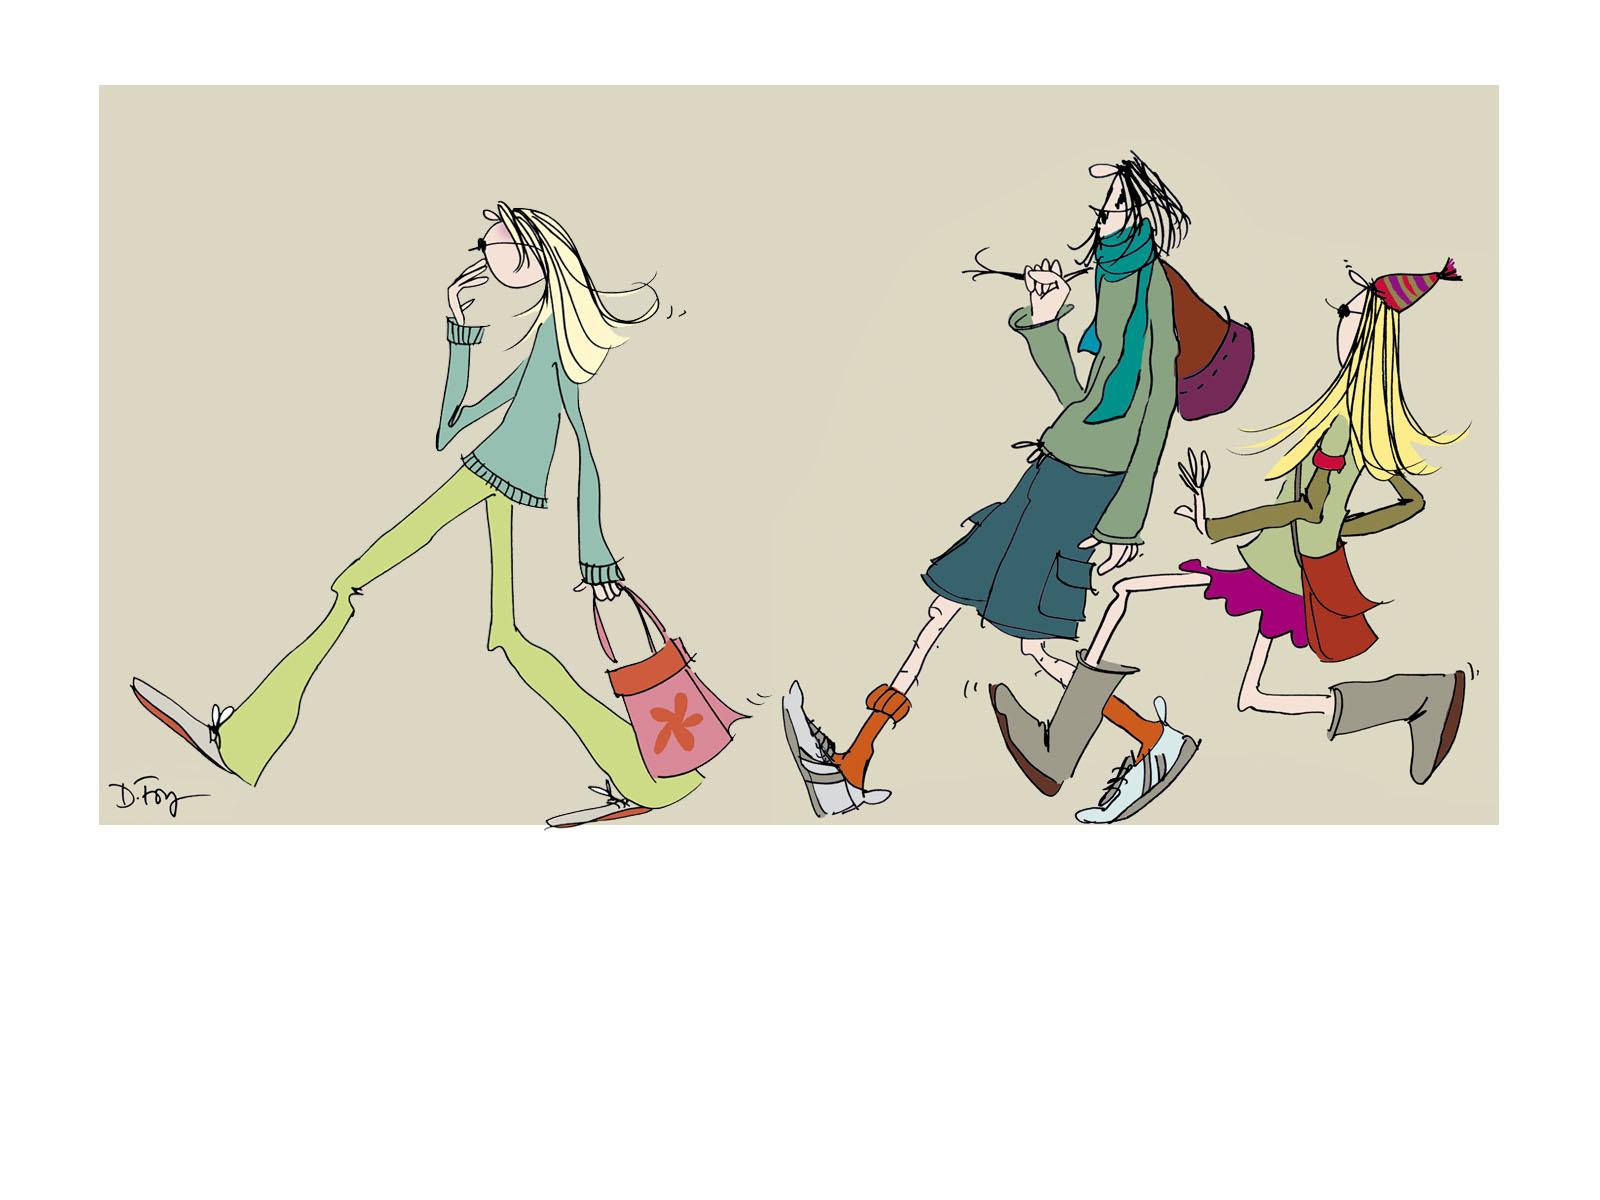 FOYDominique-Illustrations-2299